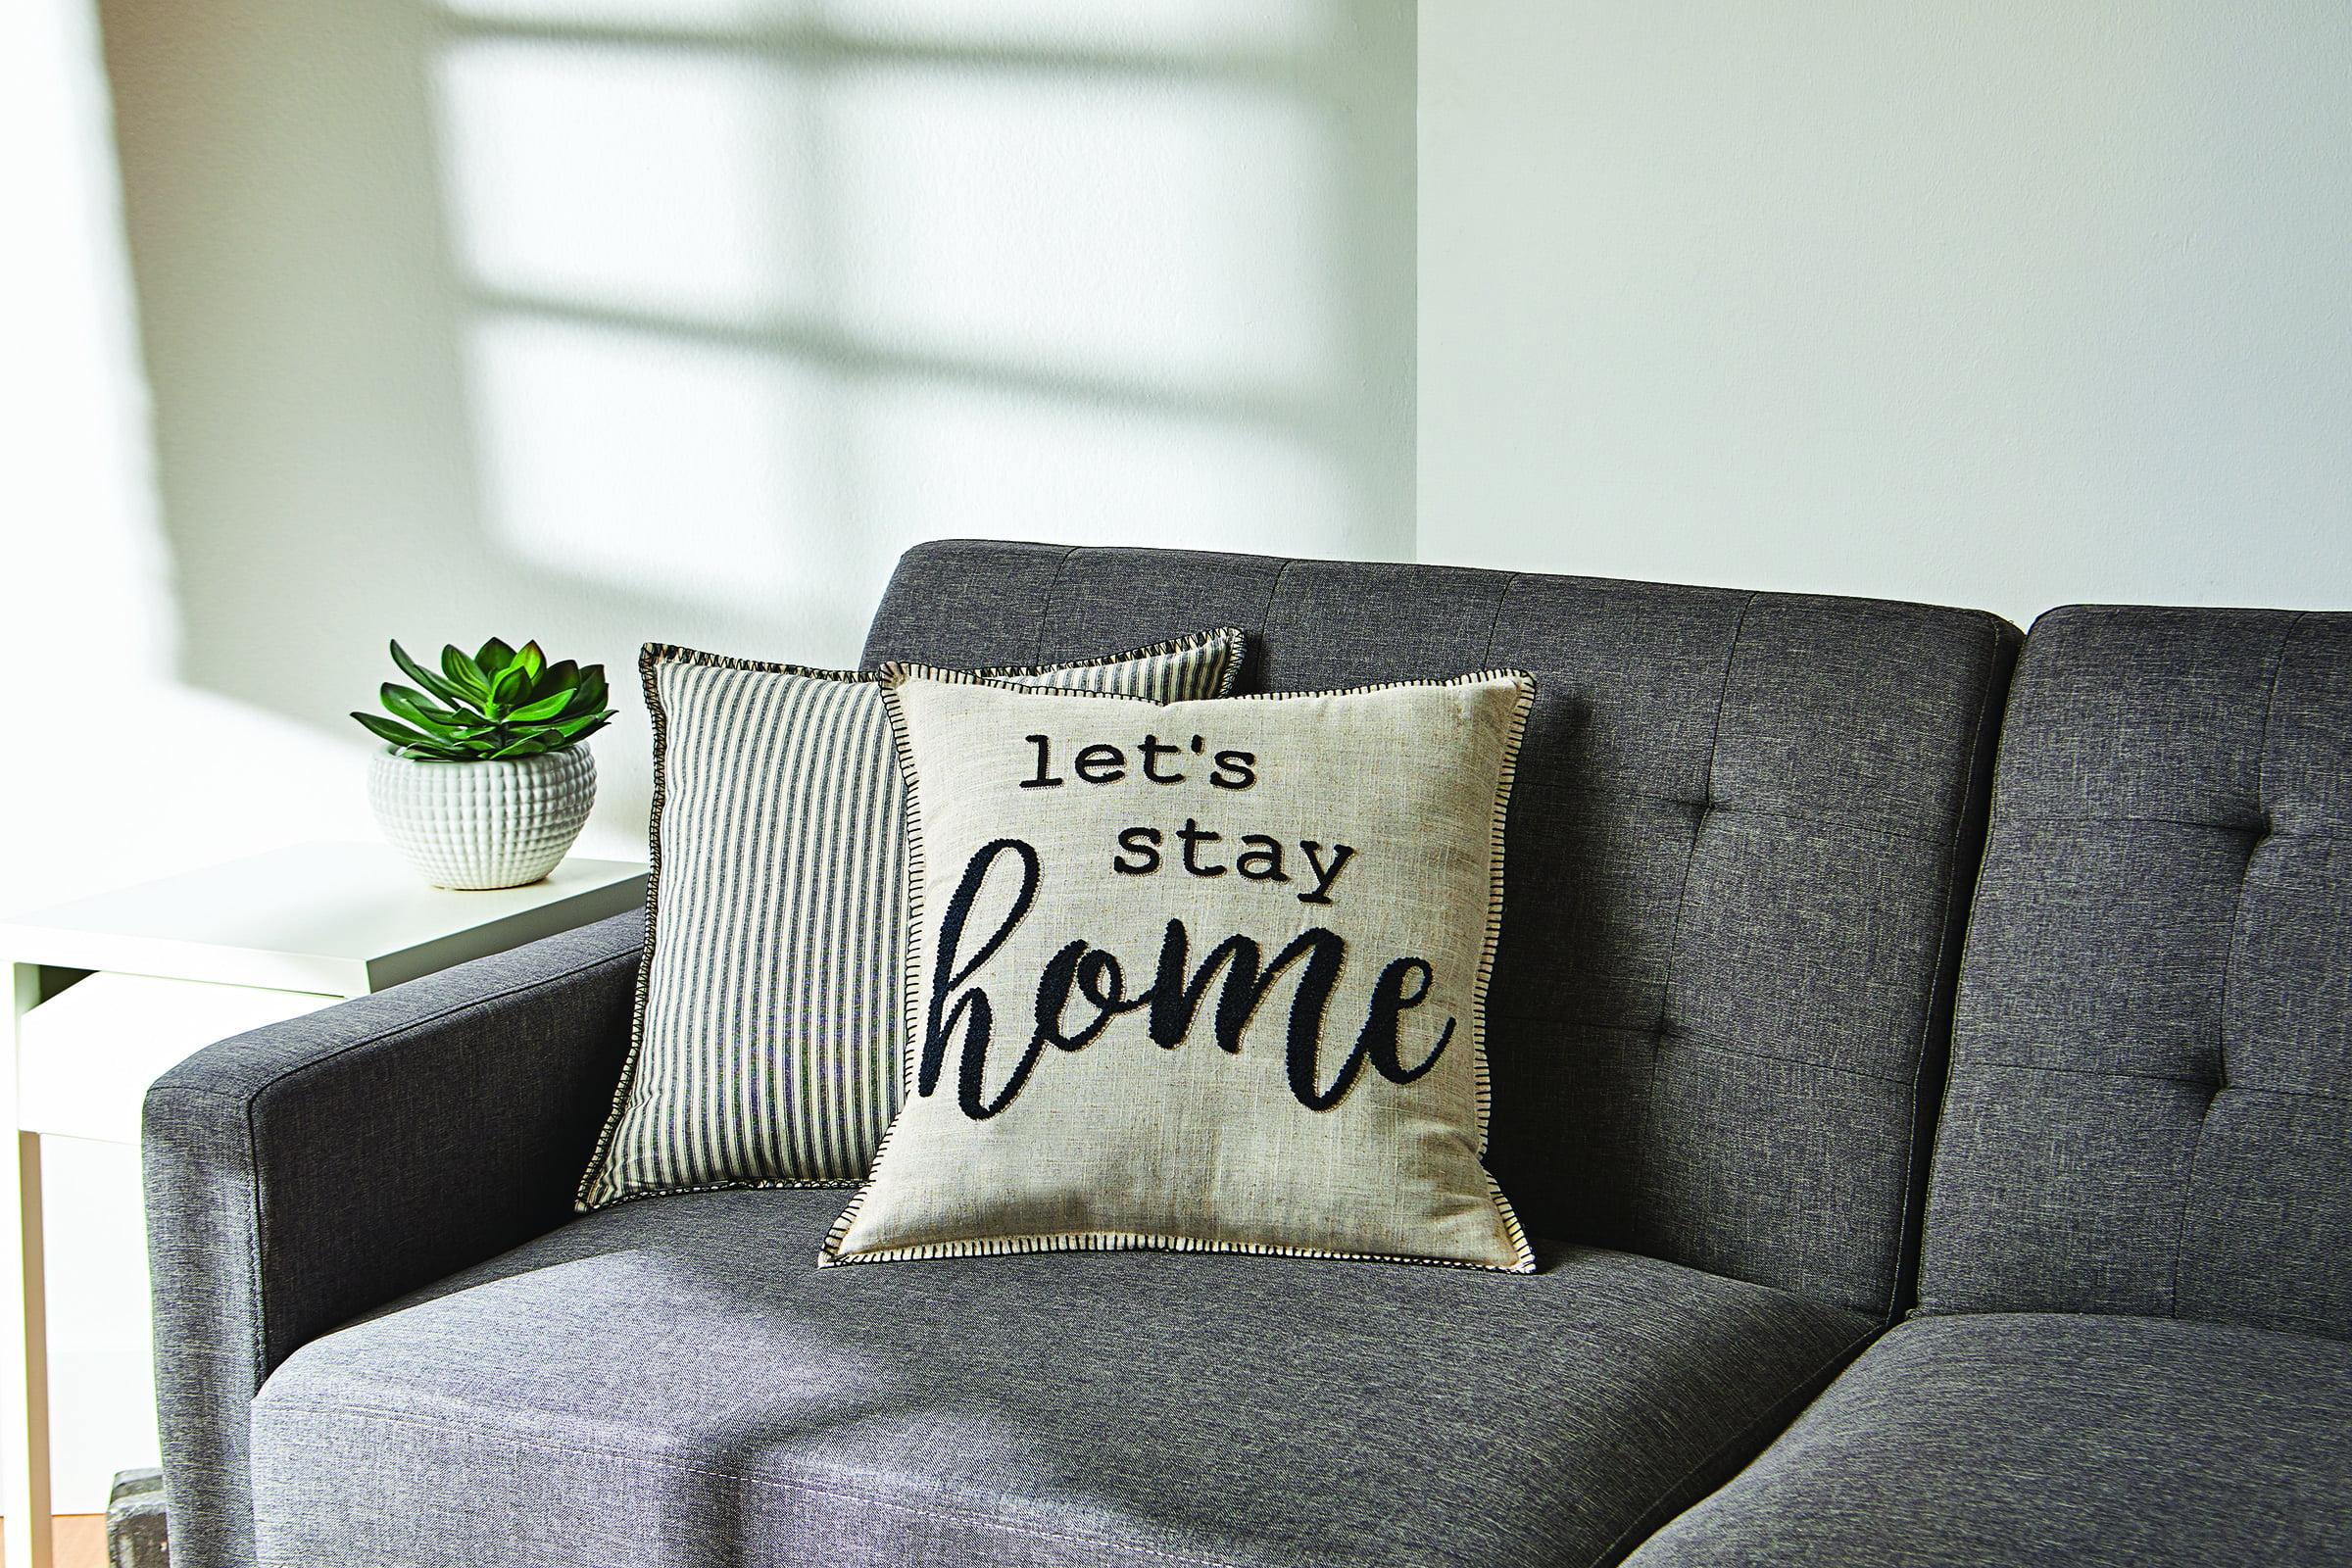 better homes gardens decorative throw pillow let s stay home sentiment square tan 18 x 18 1pack walmart com walmart com